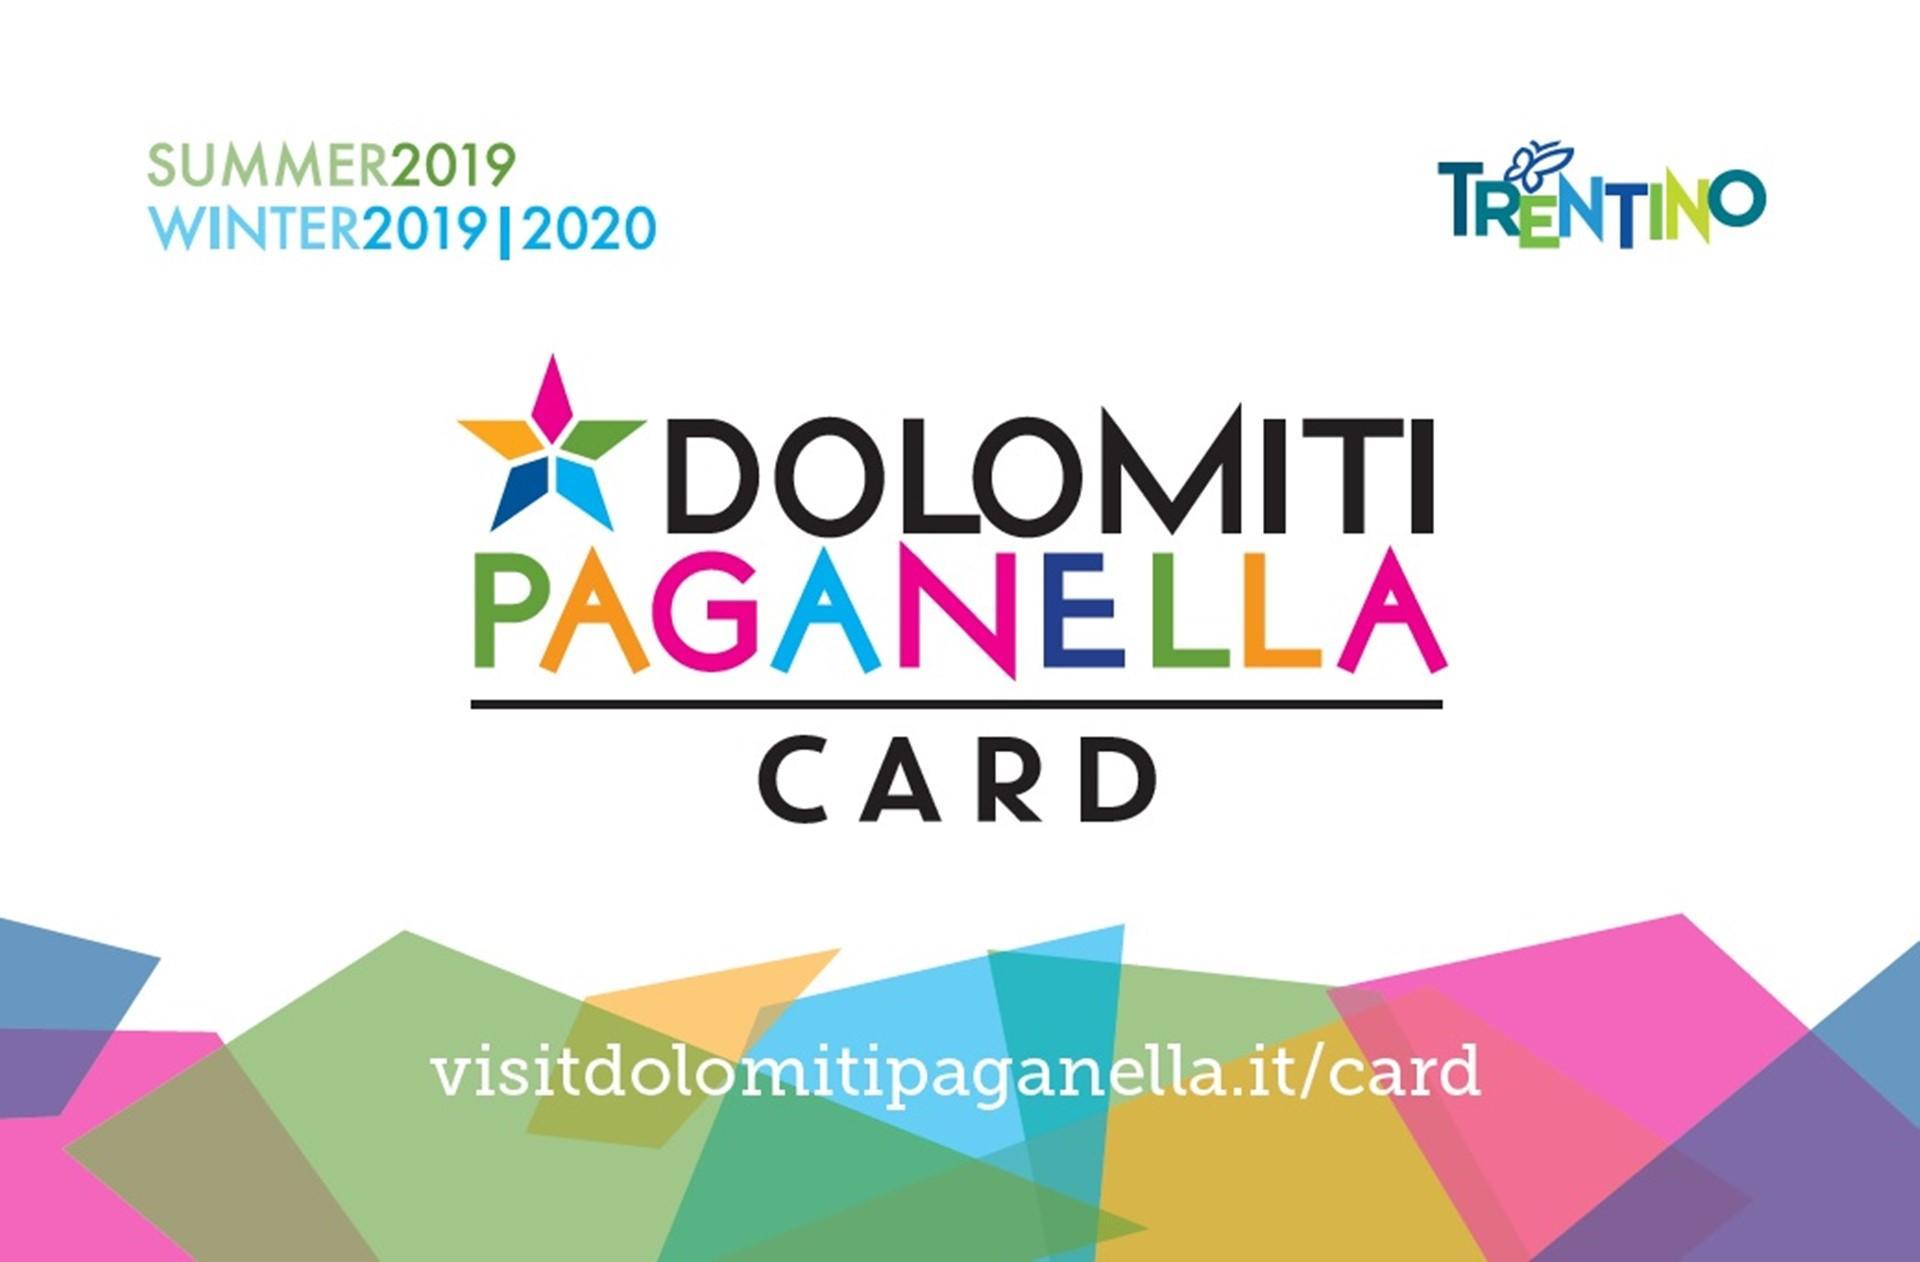 DOLOMITI PAGANELLA CARD